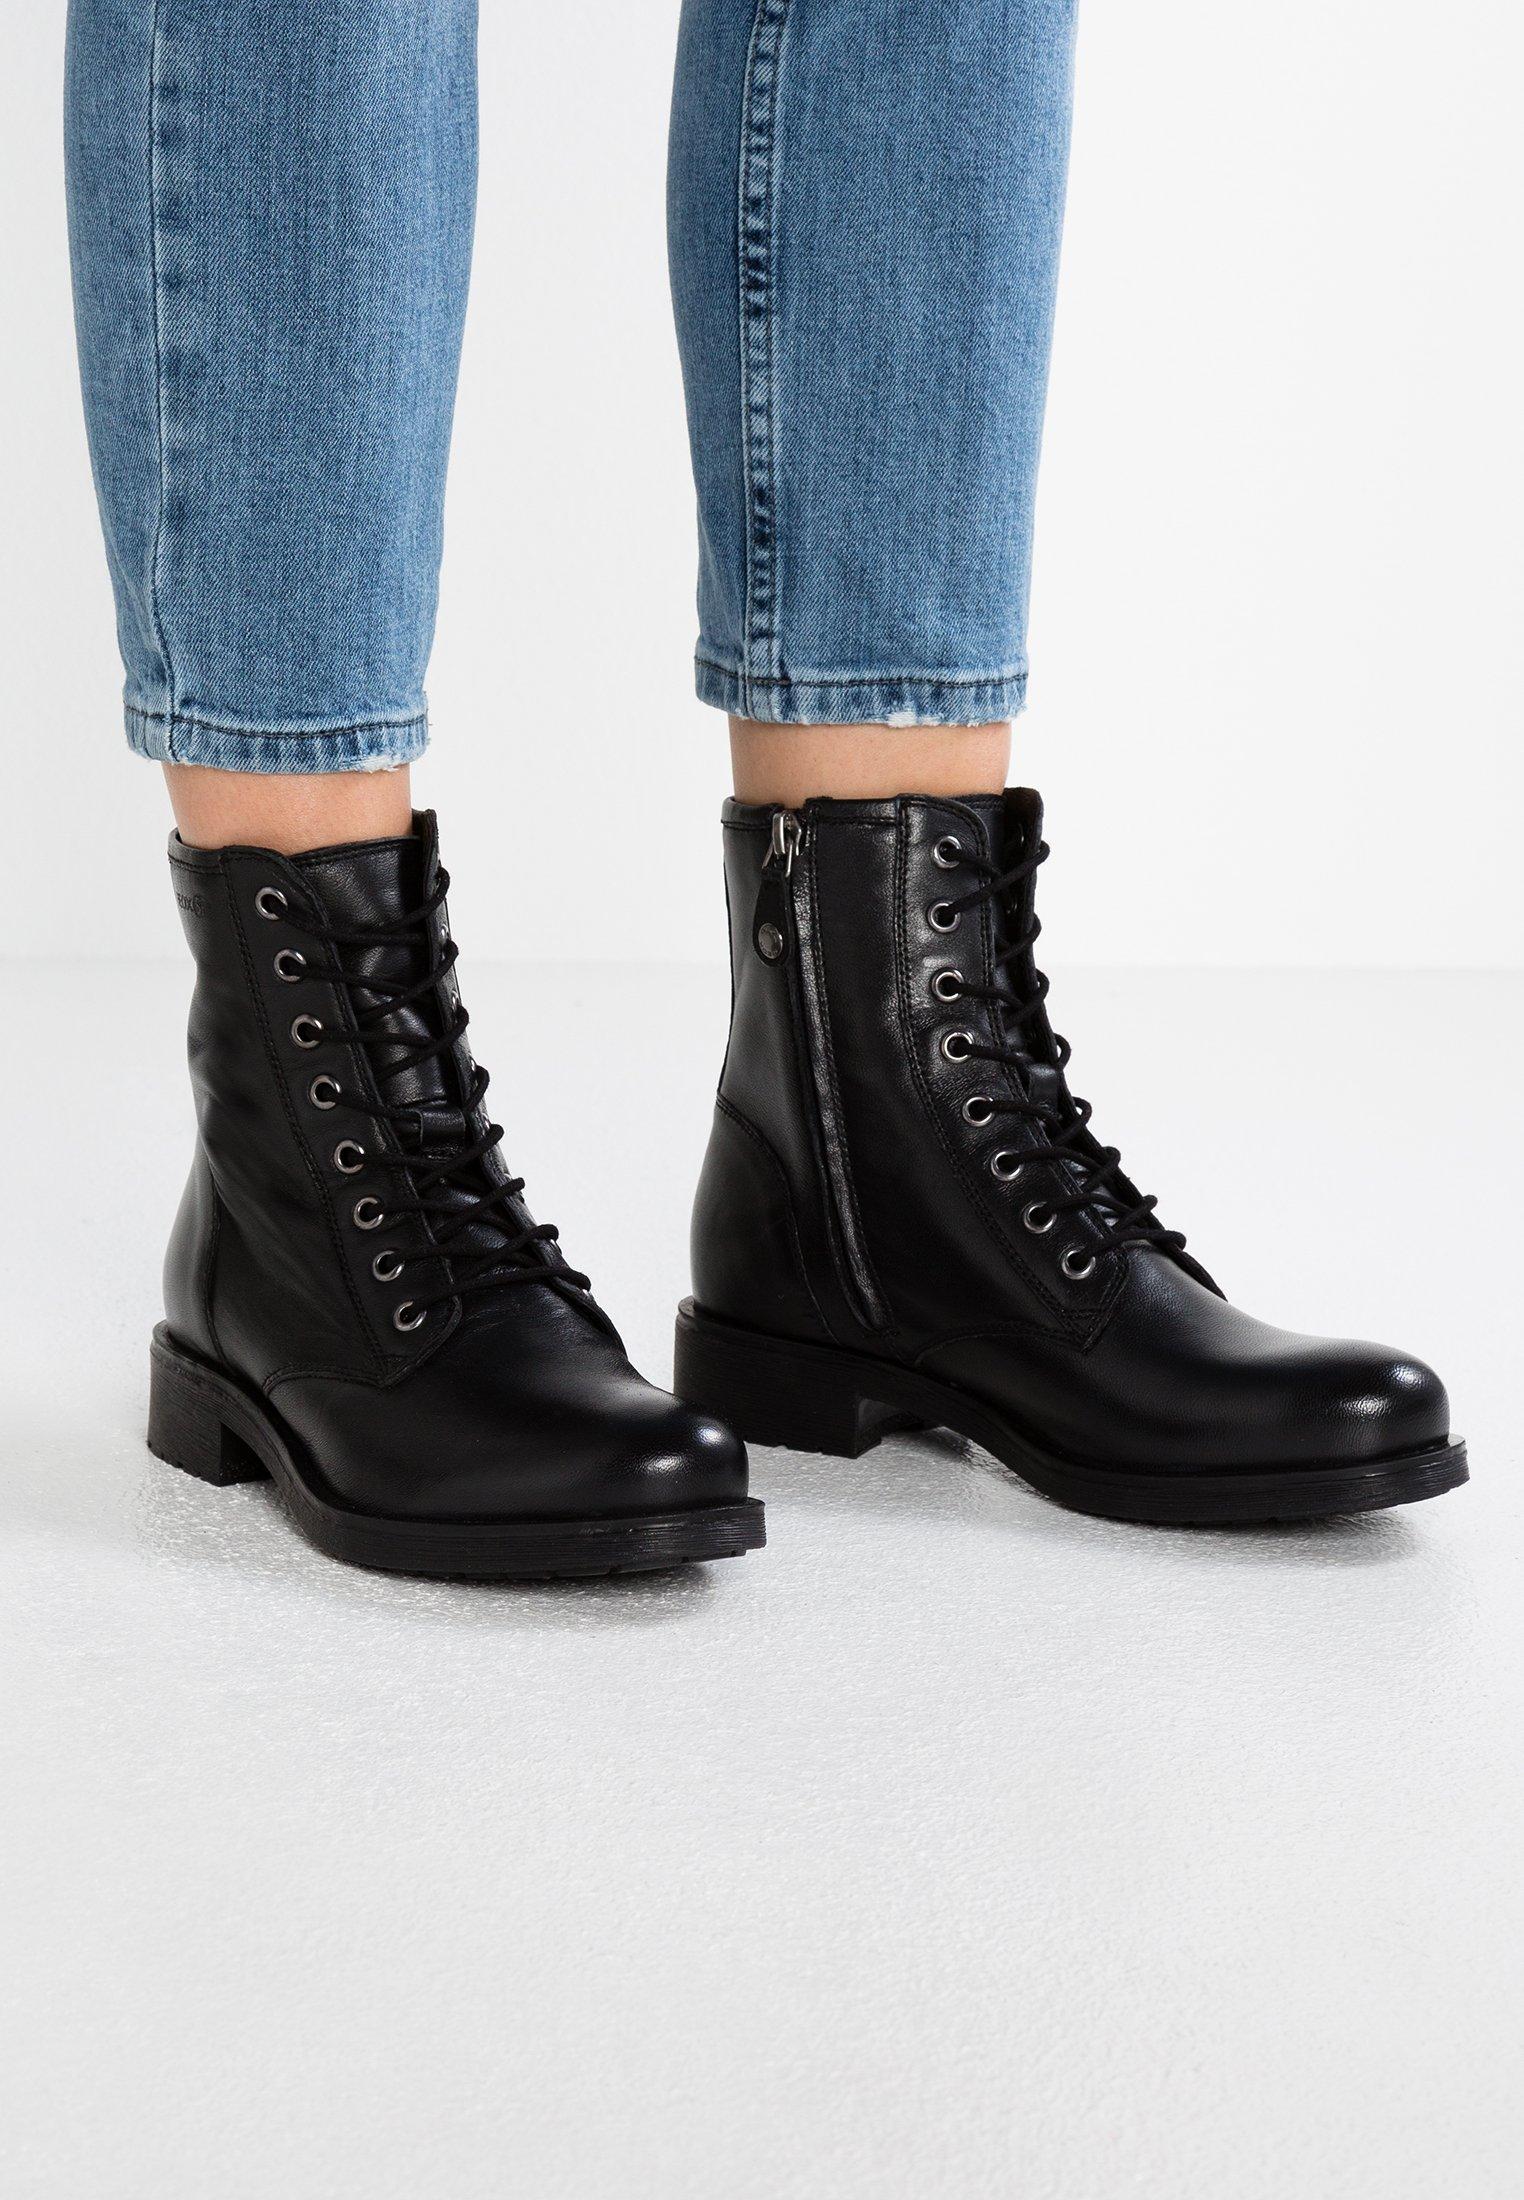 El diseño Abandonar Docenas  Geox RAWELLE - Lace-up ankle boots - black - Zalando.co.uk